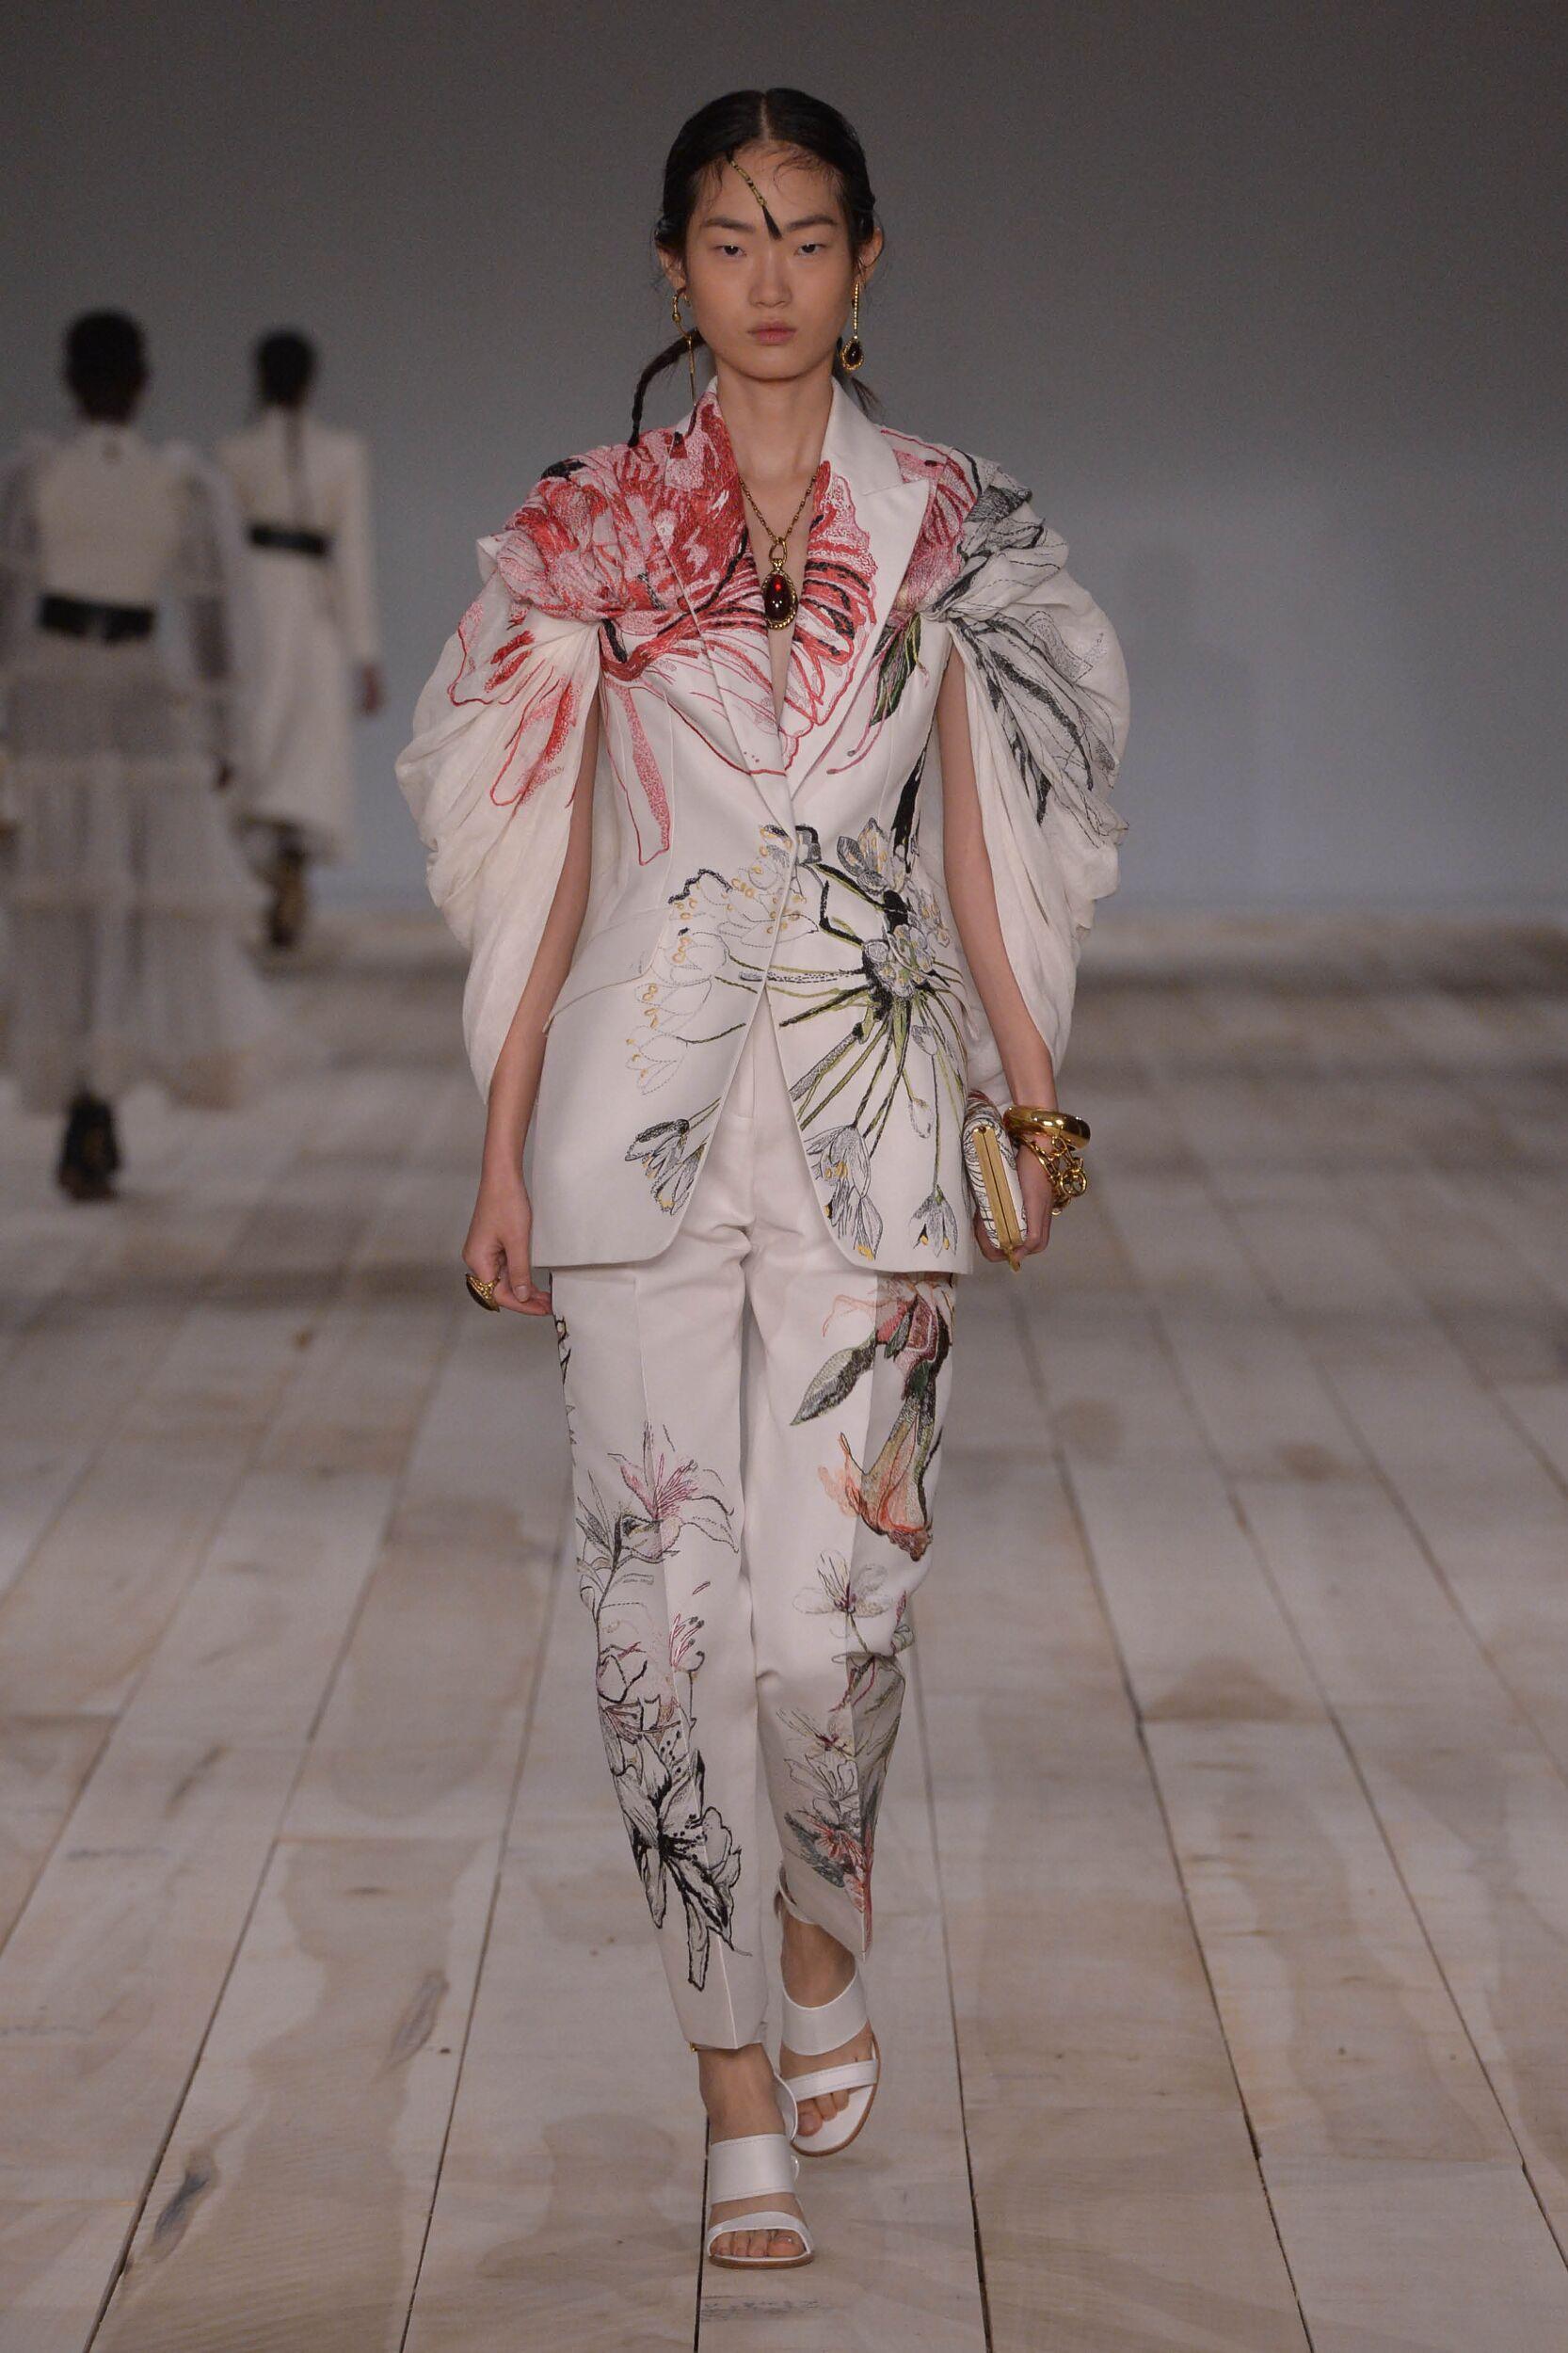 Catwalk Alexander McQueen Woman Fashion Show Summer 2020